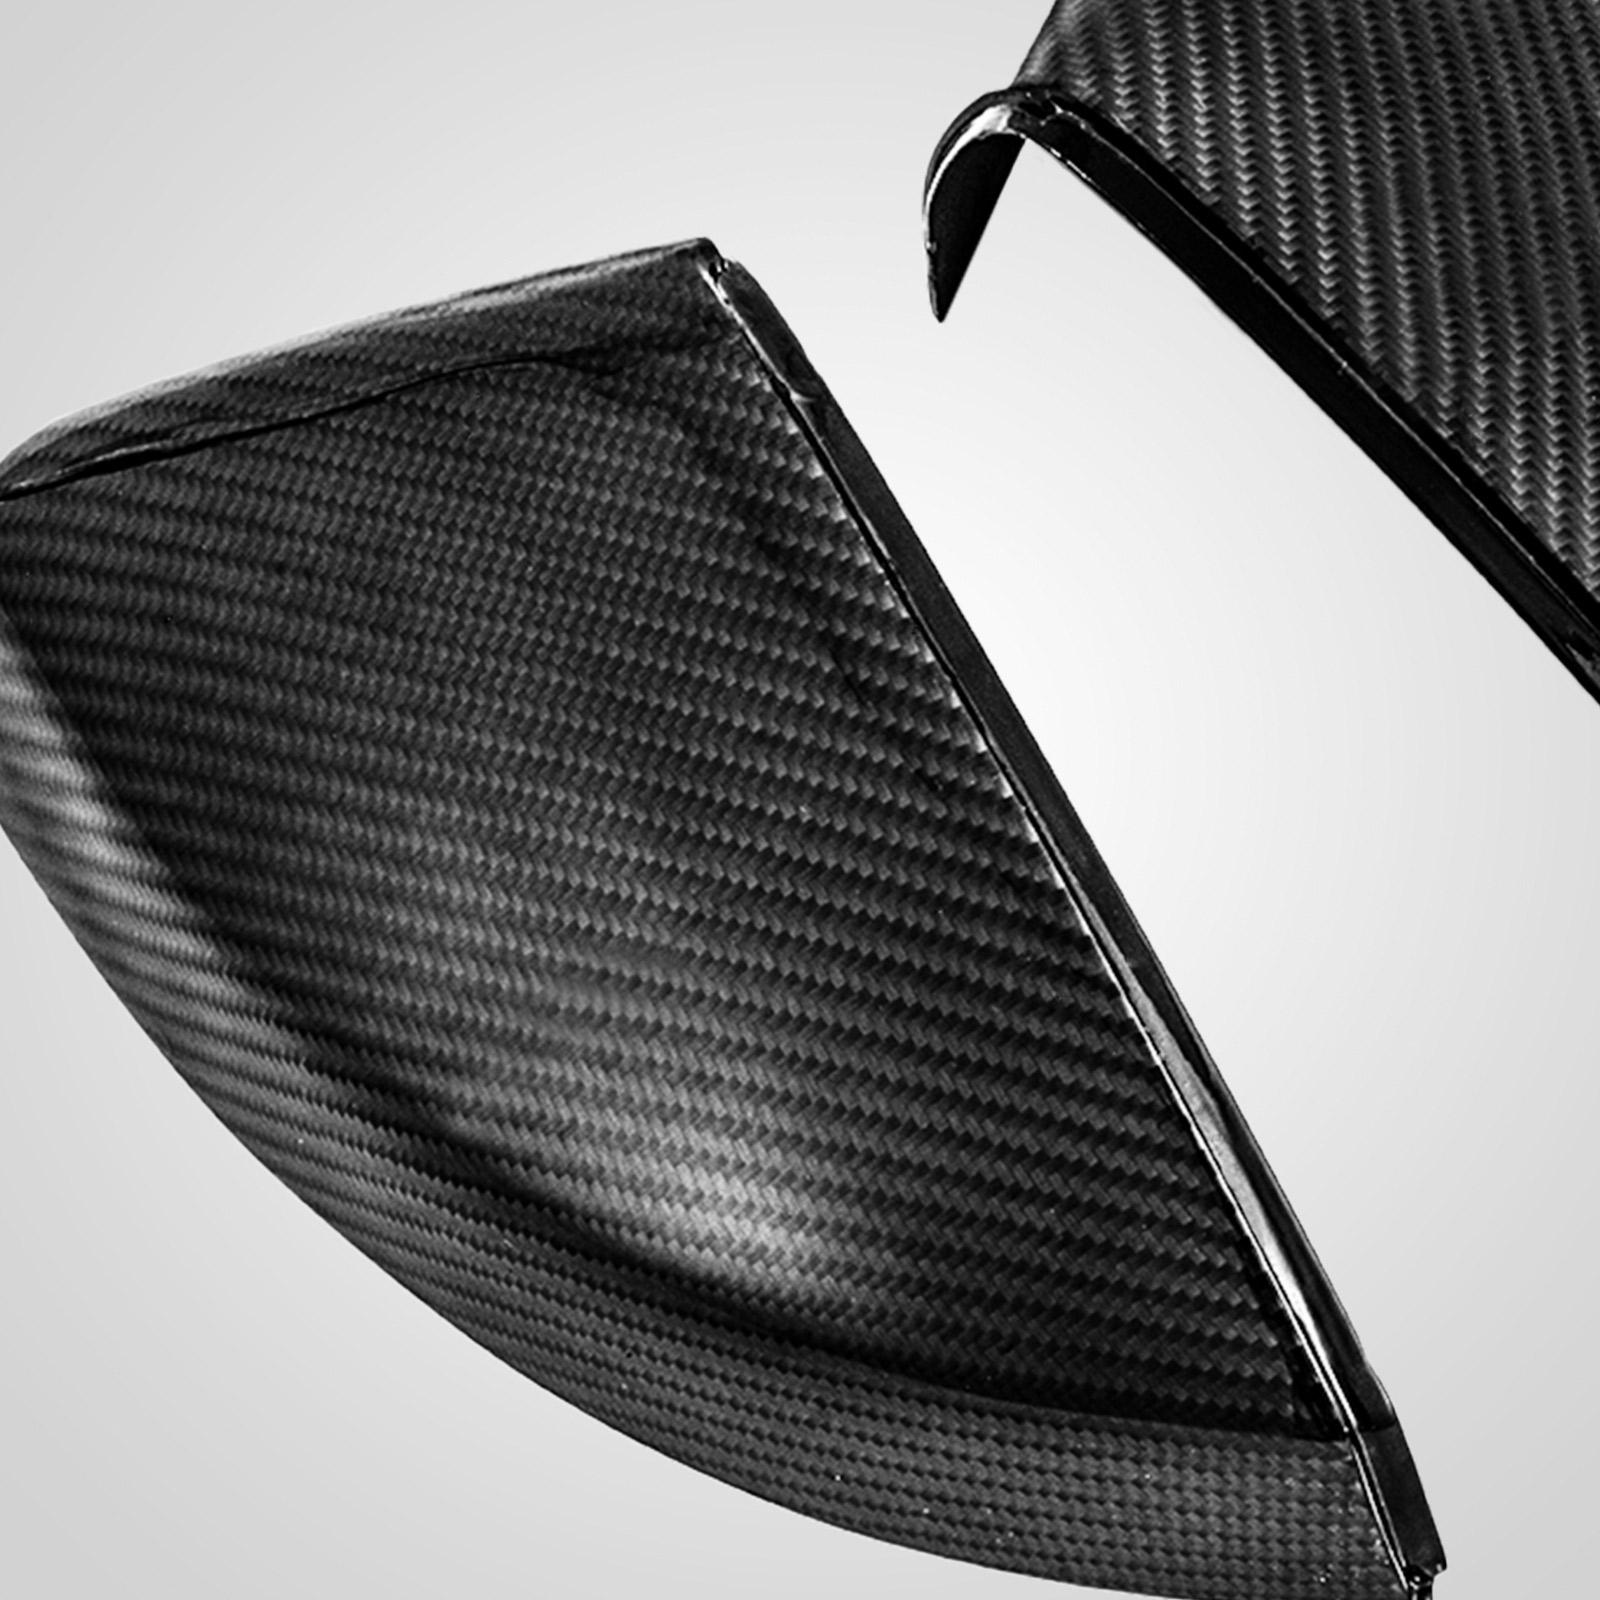 new carbon spiegelkappen spiegel geh use passend f r audi. Black Bedroom Furniture Sets. Home Design Ideas